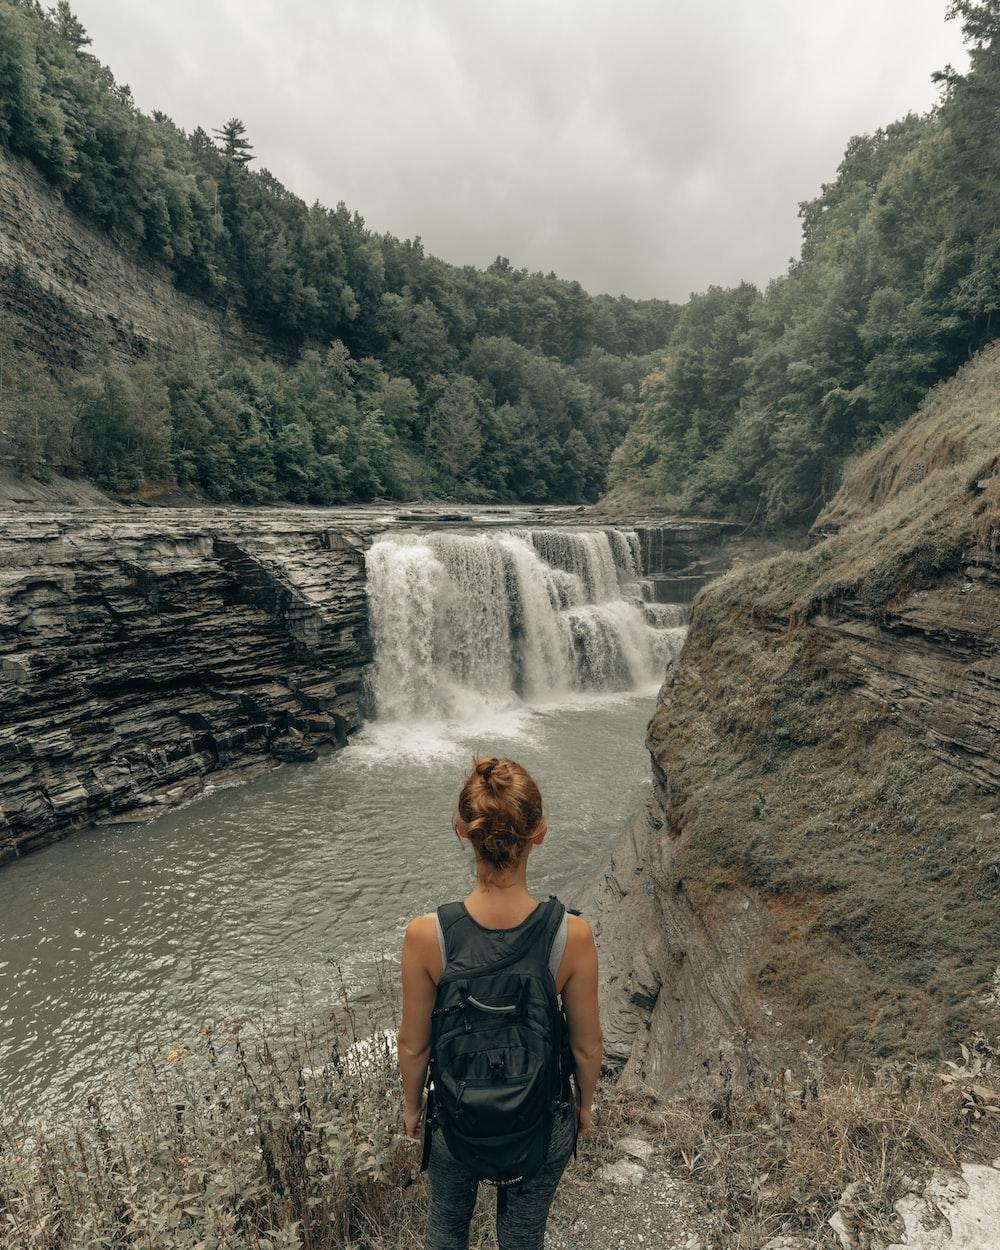 woman in black tank top sitting on rock near waterfalls during daytime